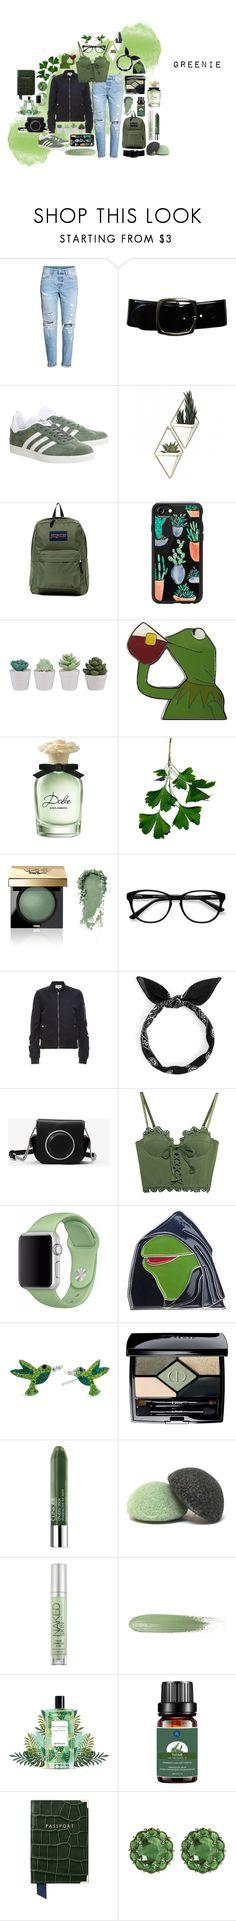 """greenie"" by shelbyyy-dx on Polyvore featuring H&M, Chanel, adidas, Umbra, JanSport, Casetify, Dolce&Gabbana, Bobbi Brown Cosmetics, EyeBuyDirect.com and BB Dakota"